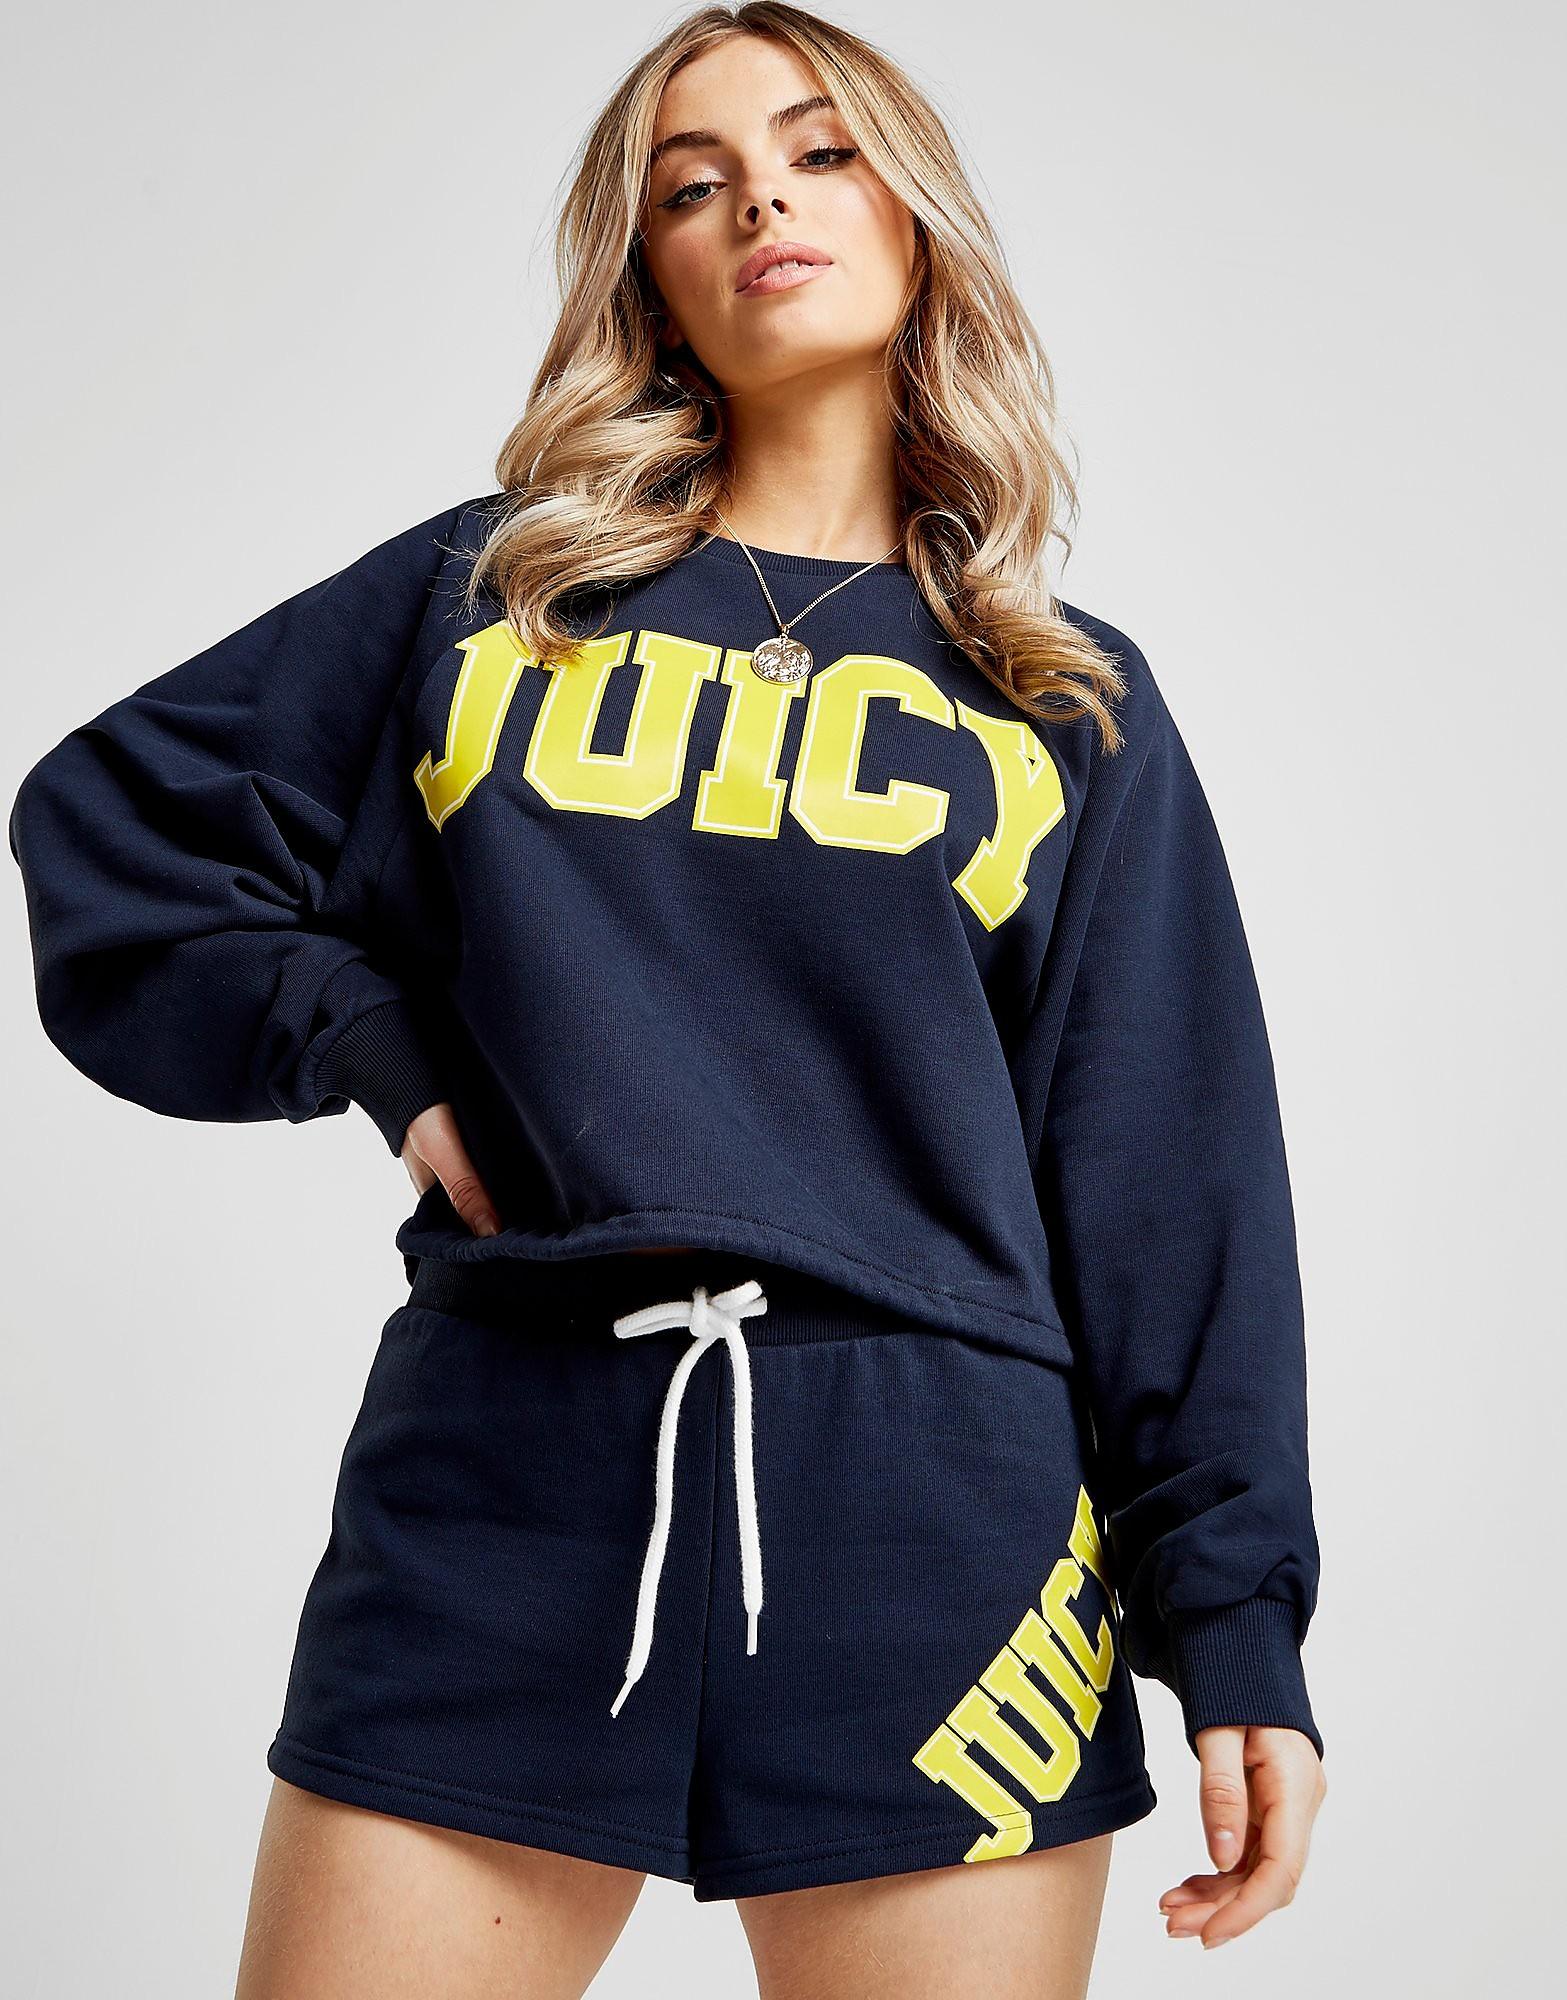 Juicy by Juicy Couture Logo Tie Crew Sweatshirt